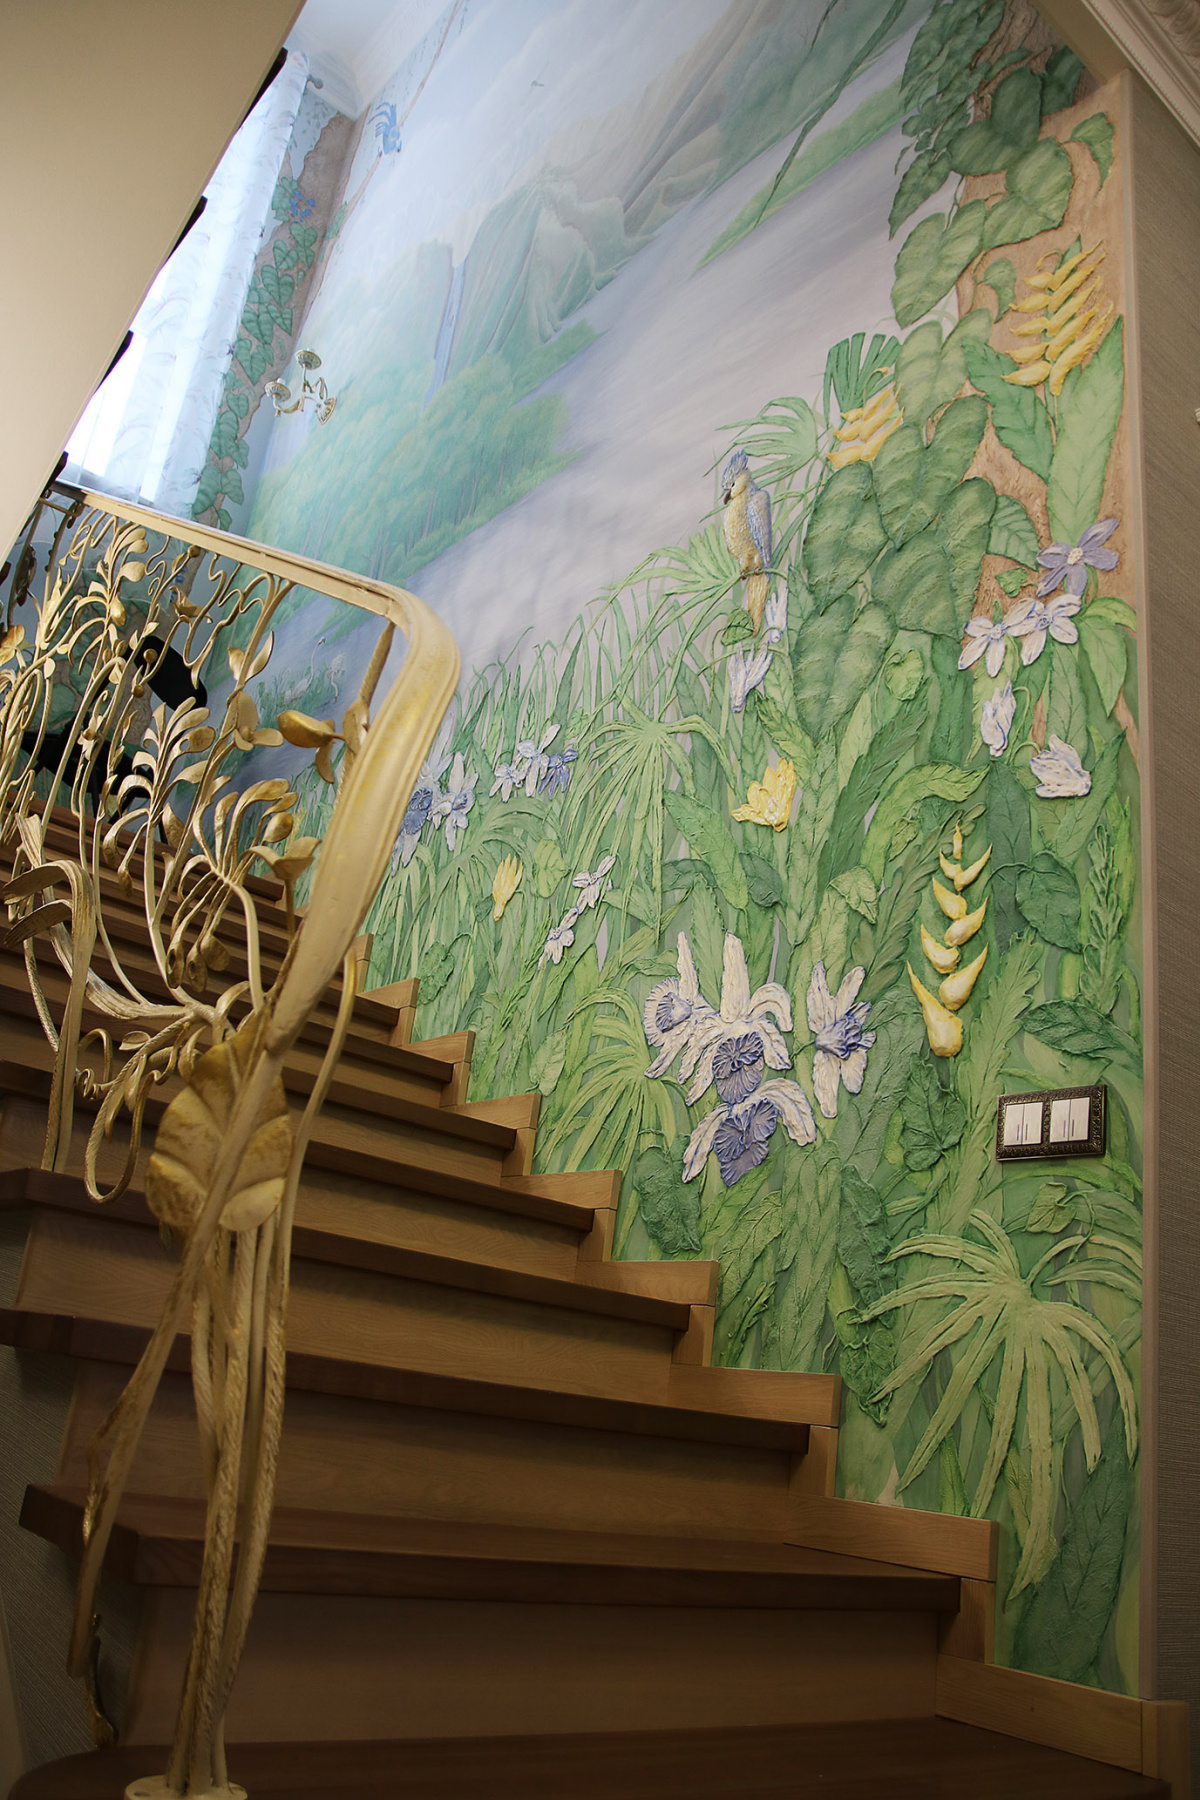 "Yaroslav Yurievna Maksimova. Surround wall painting, Tropical landscape """